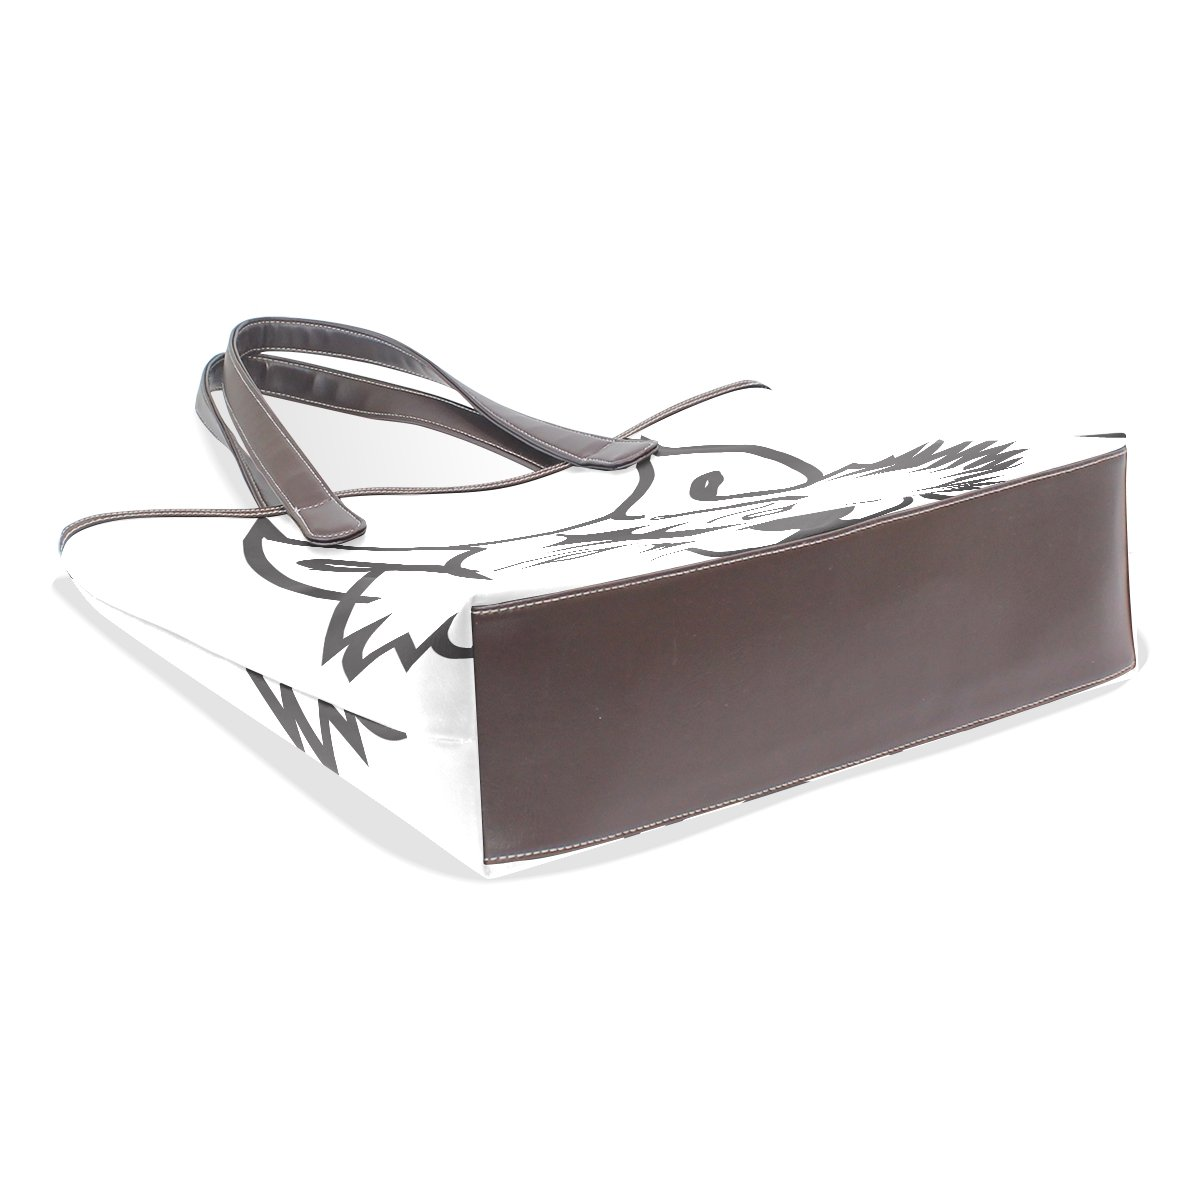 Ye Store Wolf Line Lady PU Leather Handbag Tote Bag Shoulder Bag Shopping Bag